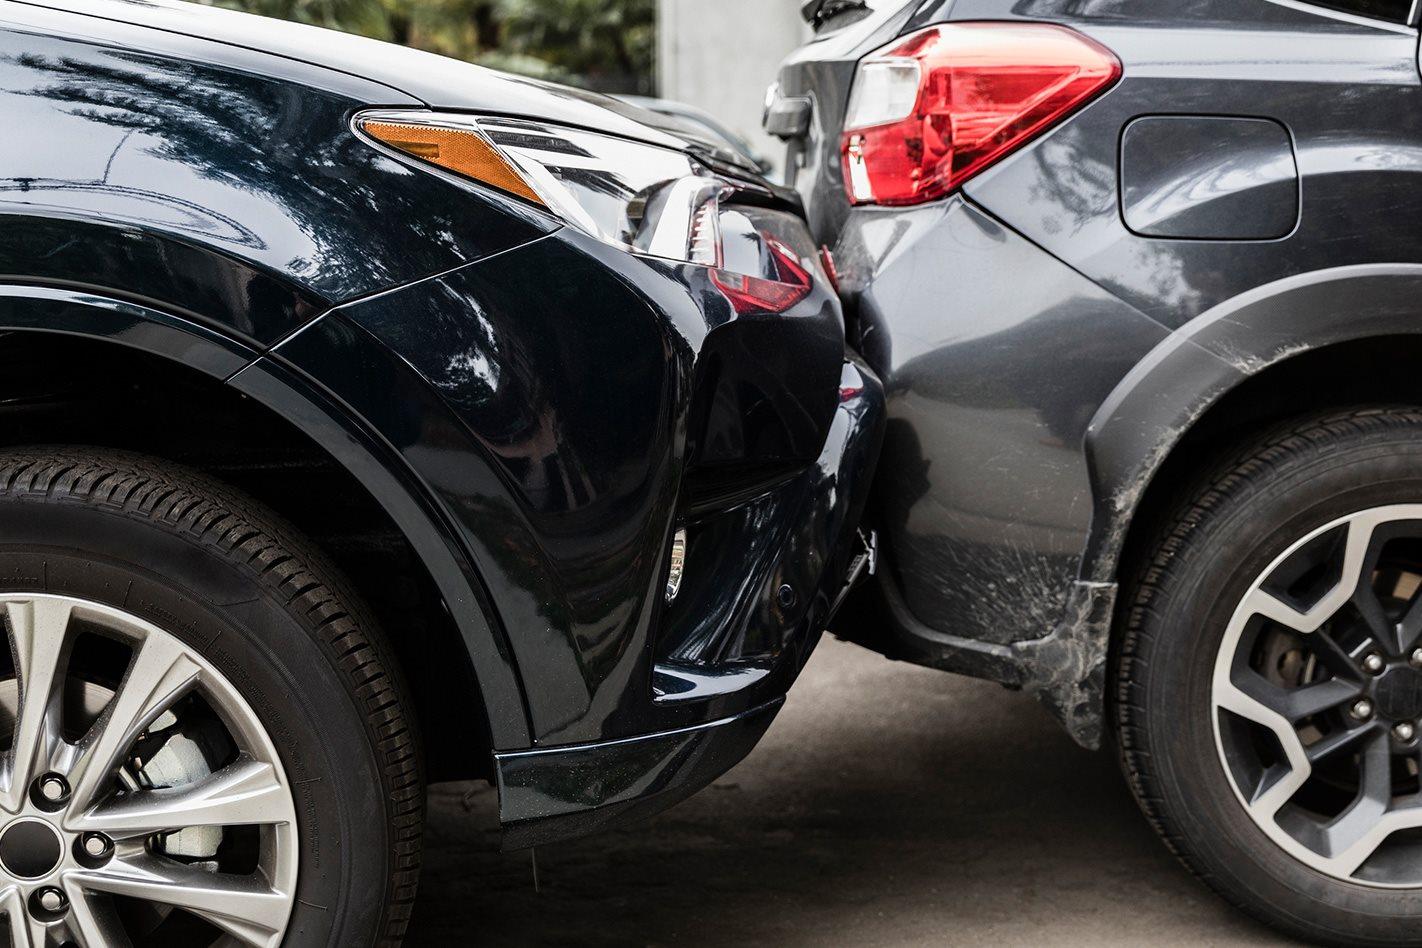 What happens when you have a car crash